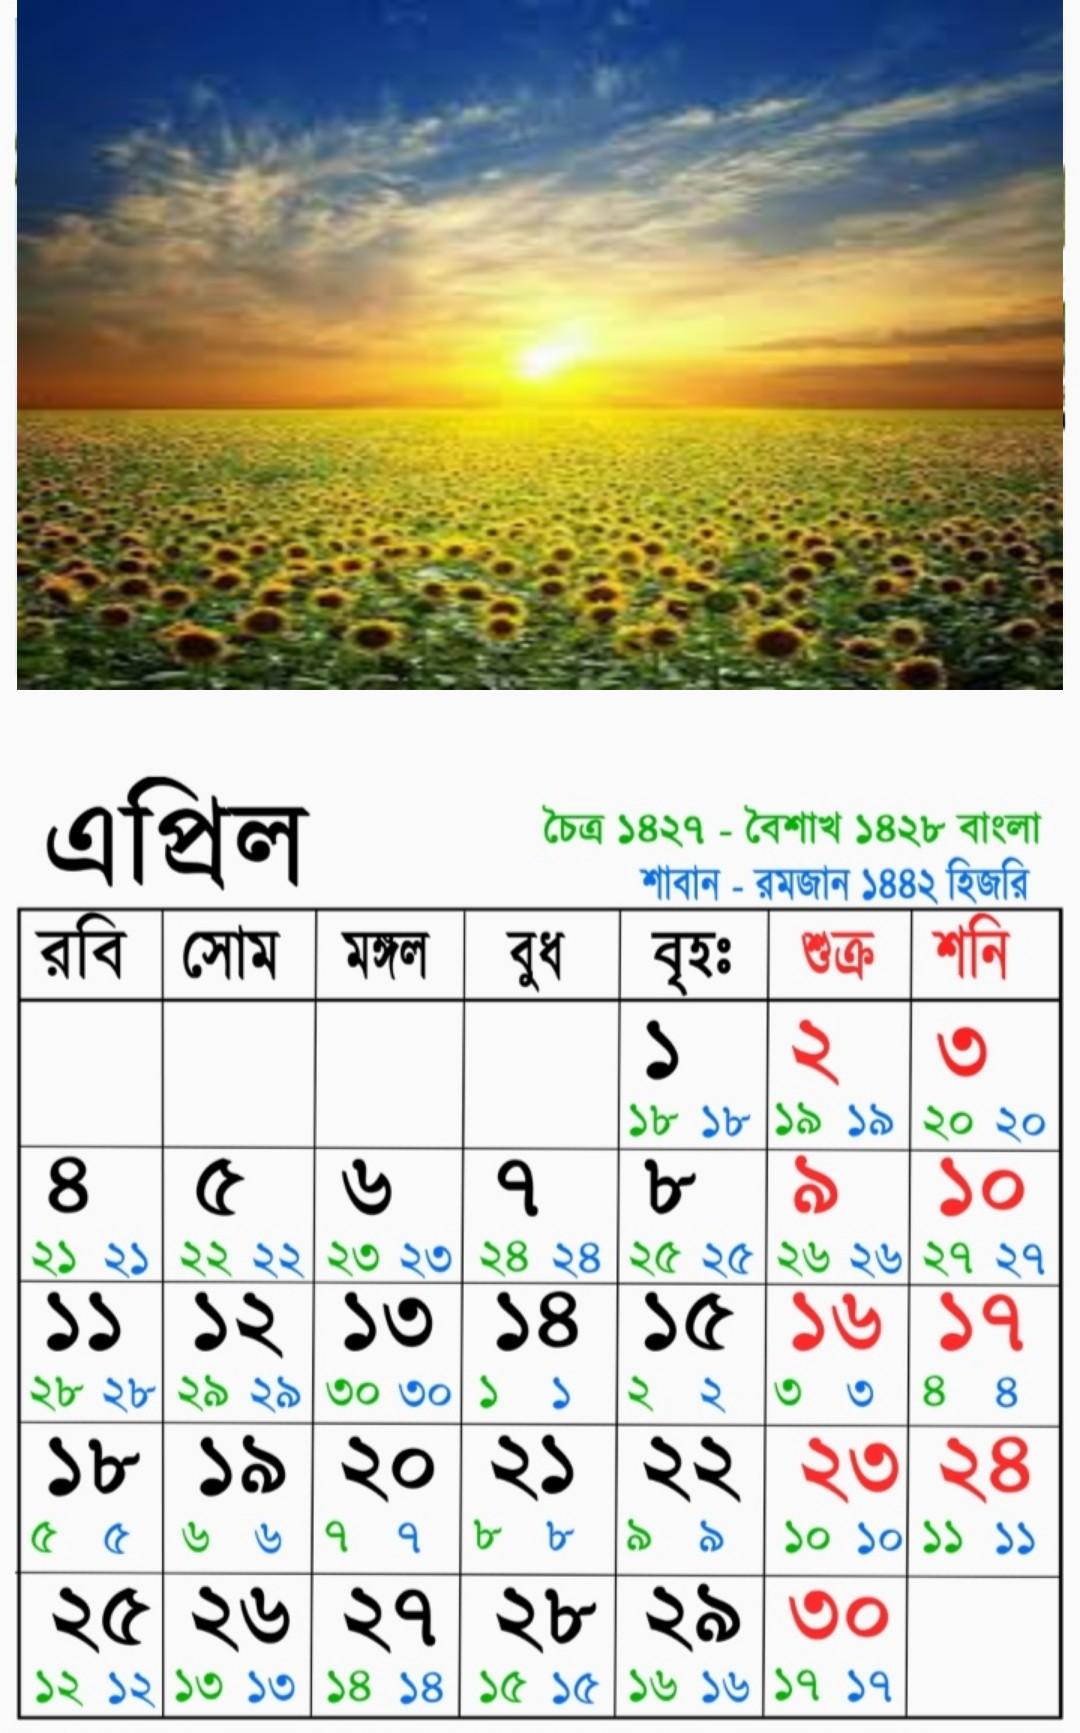 April  Bangla English Arabi Calendar 2021 | এপ্রিল বাংলা ইংরেজি আরবি ক্যালেন্ডার ২০২১